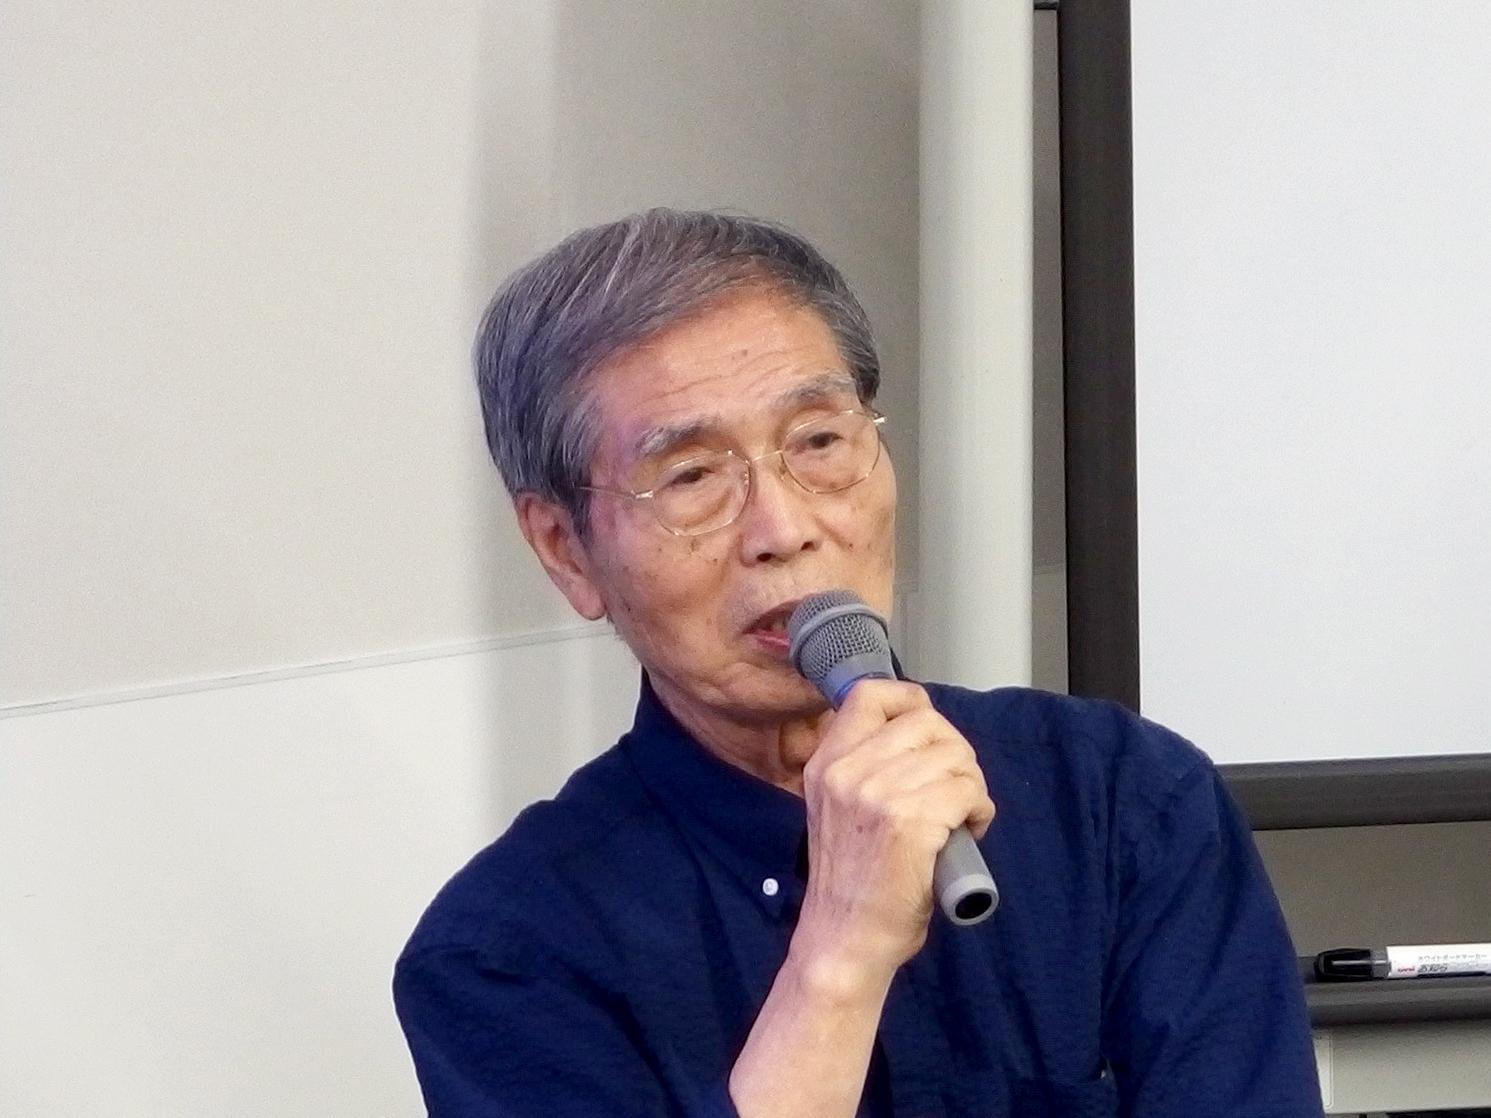 中村征宏 (Yukihiro  Nakamura))